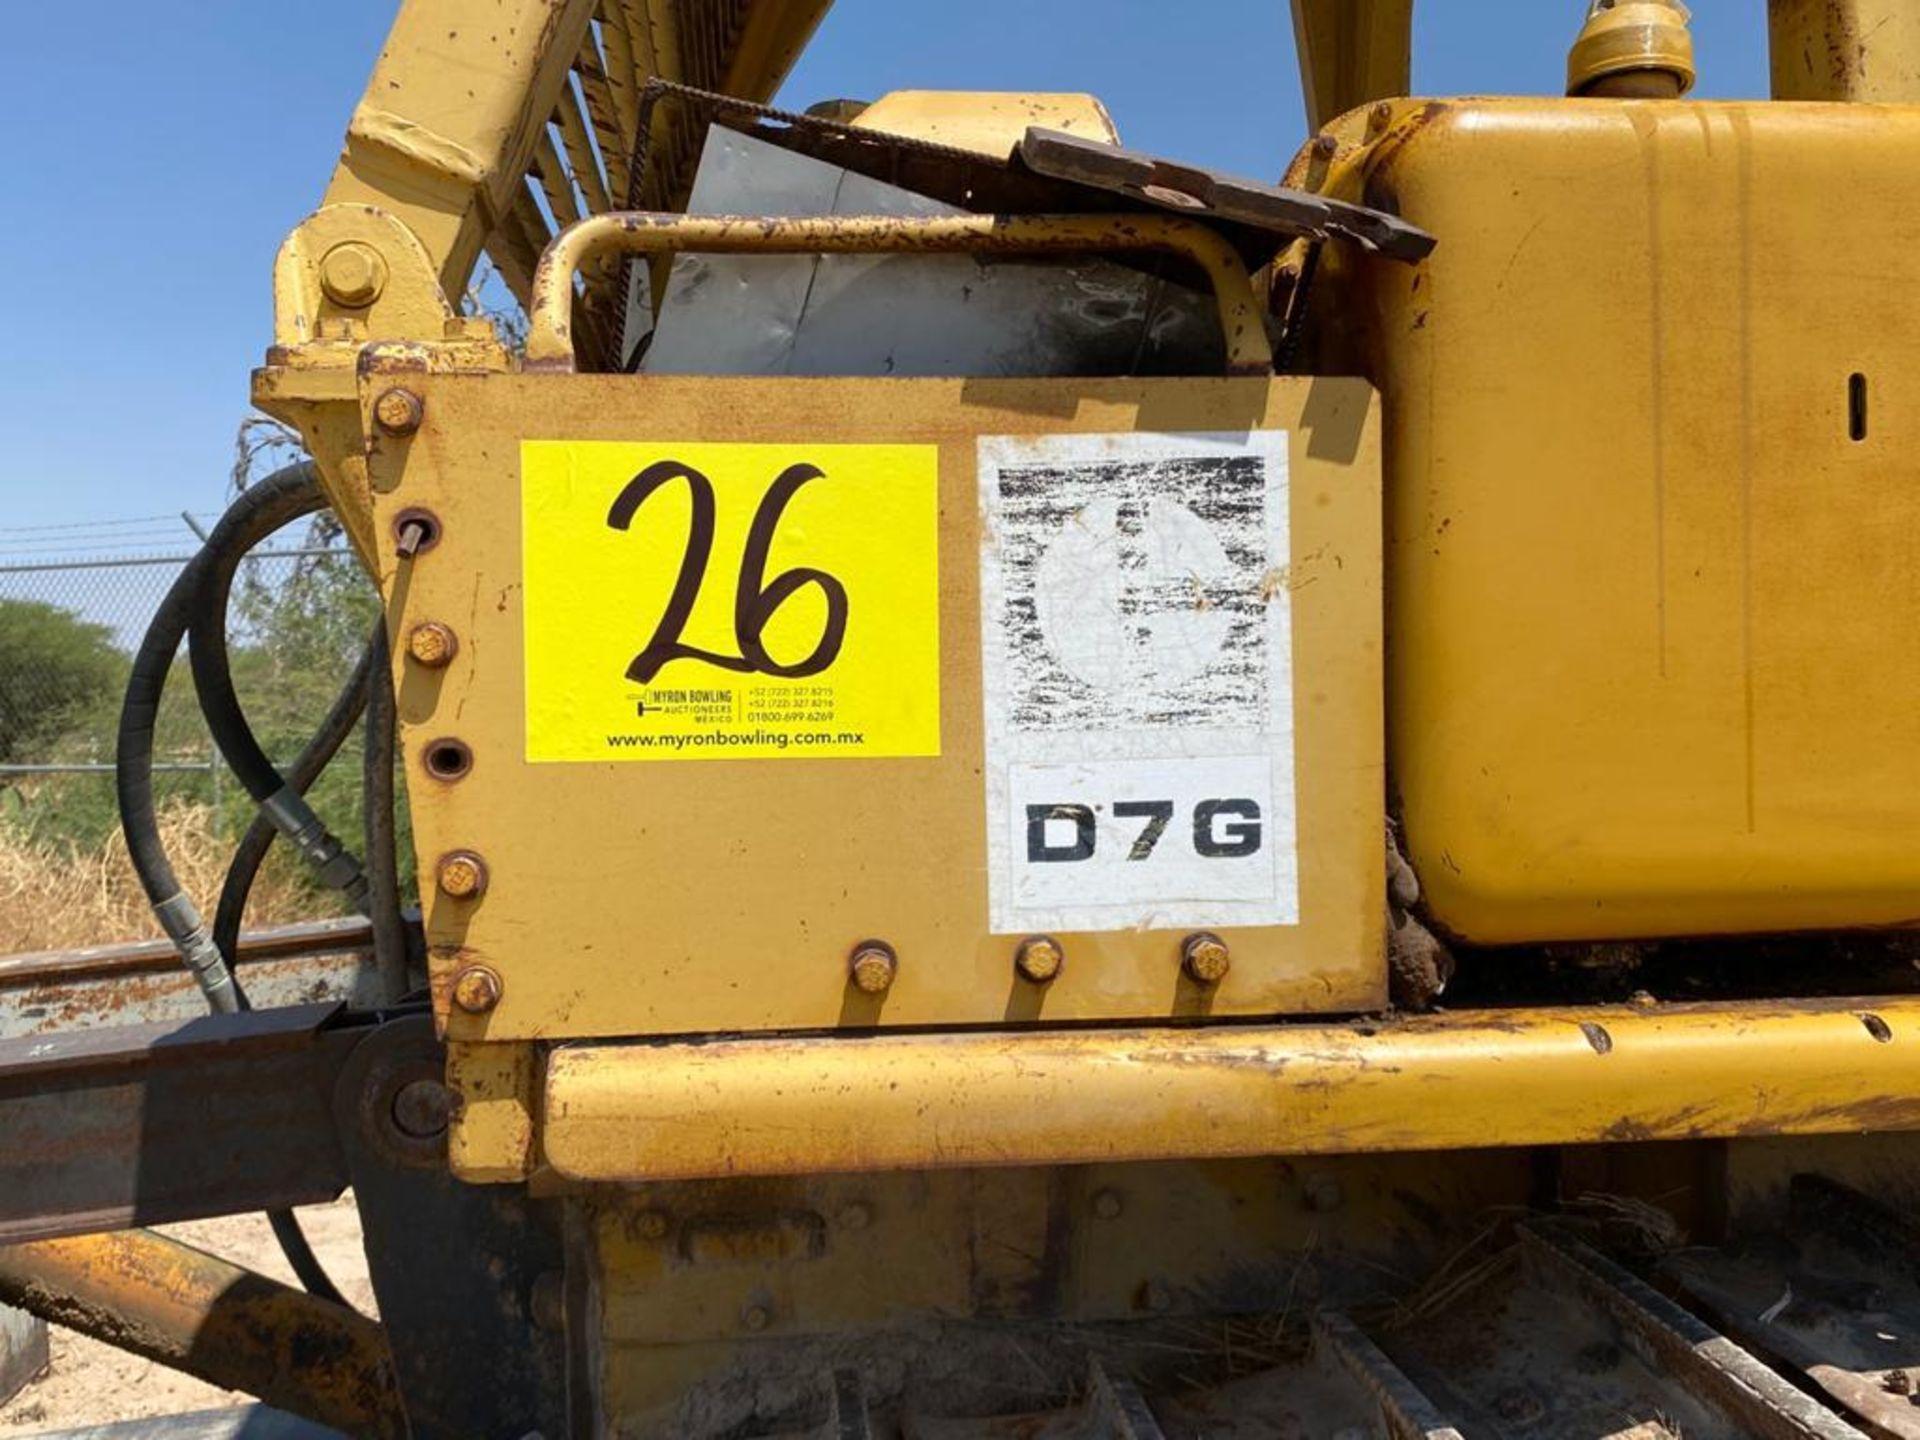 Caterpillar D7G Bulldozer, Serial number 92V5897, Diesel motor - Image 43 of 48